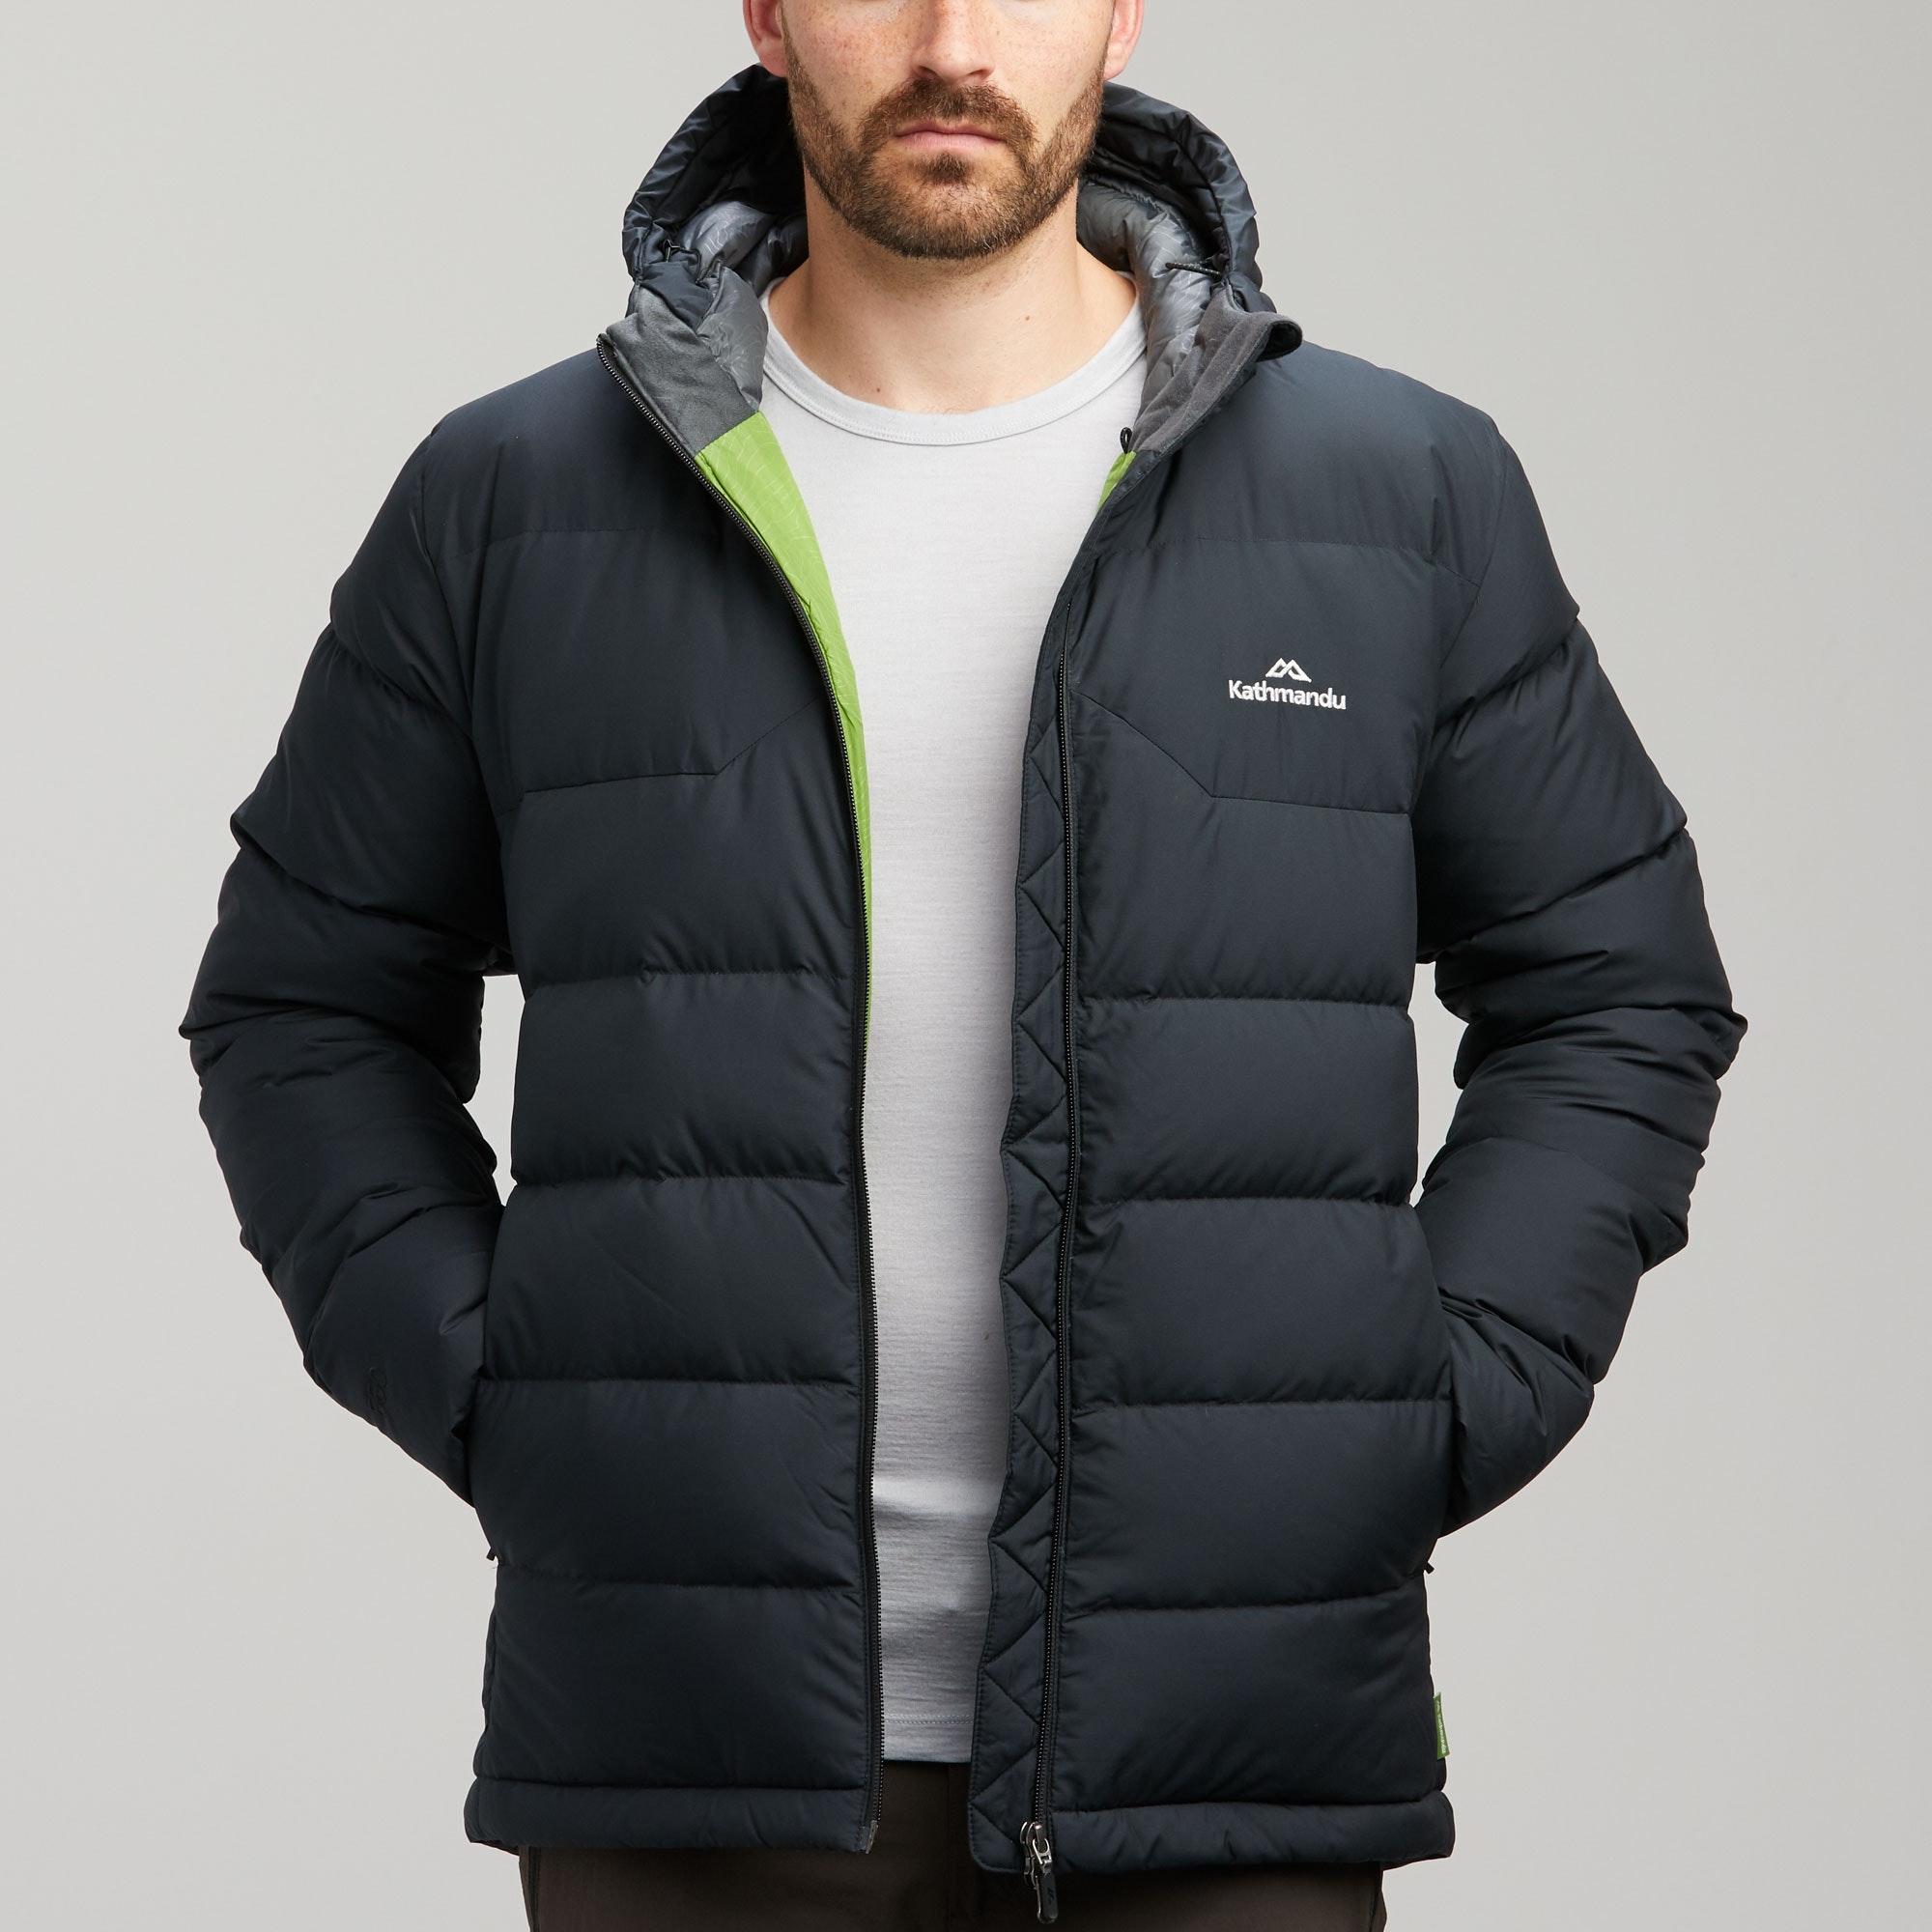 NEW-Kathmandu-Epiq-Men-039-s-Hooded-Warm-Winter-Duck-Down-Puffer-Jacket-v2 thumbnail 10